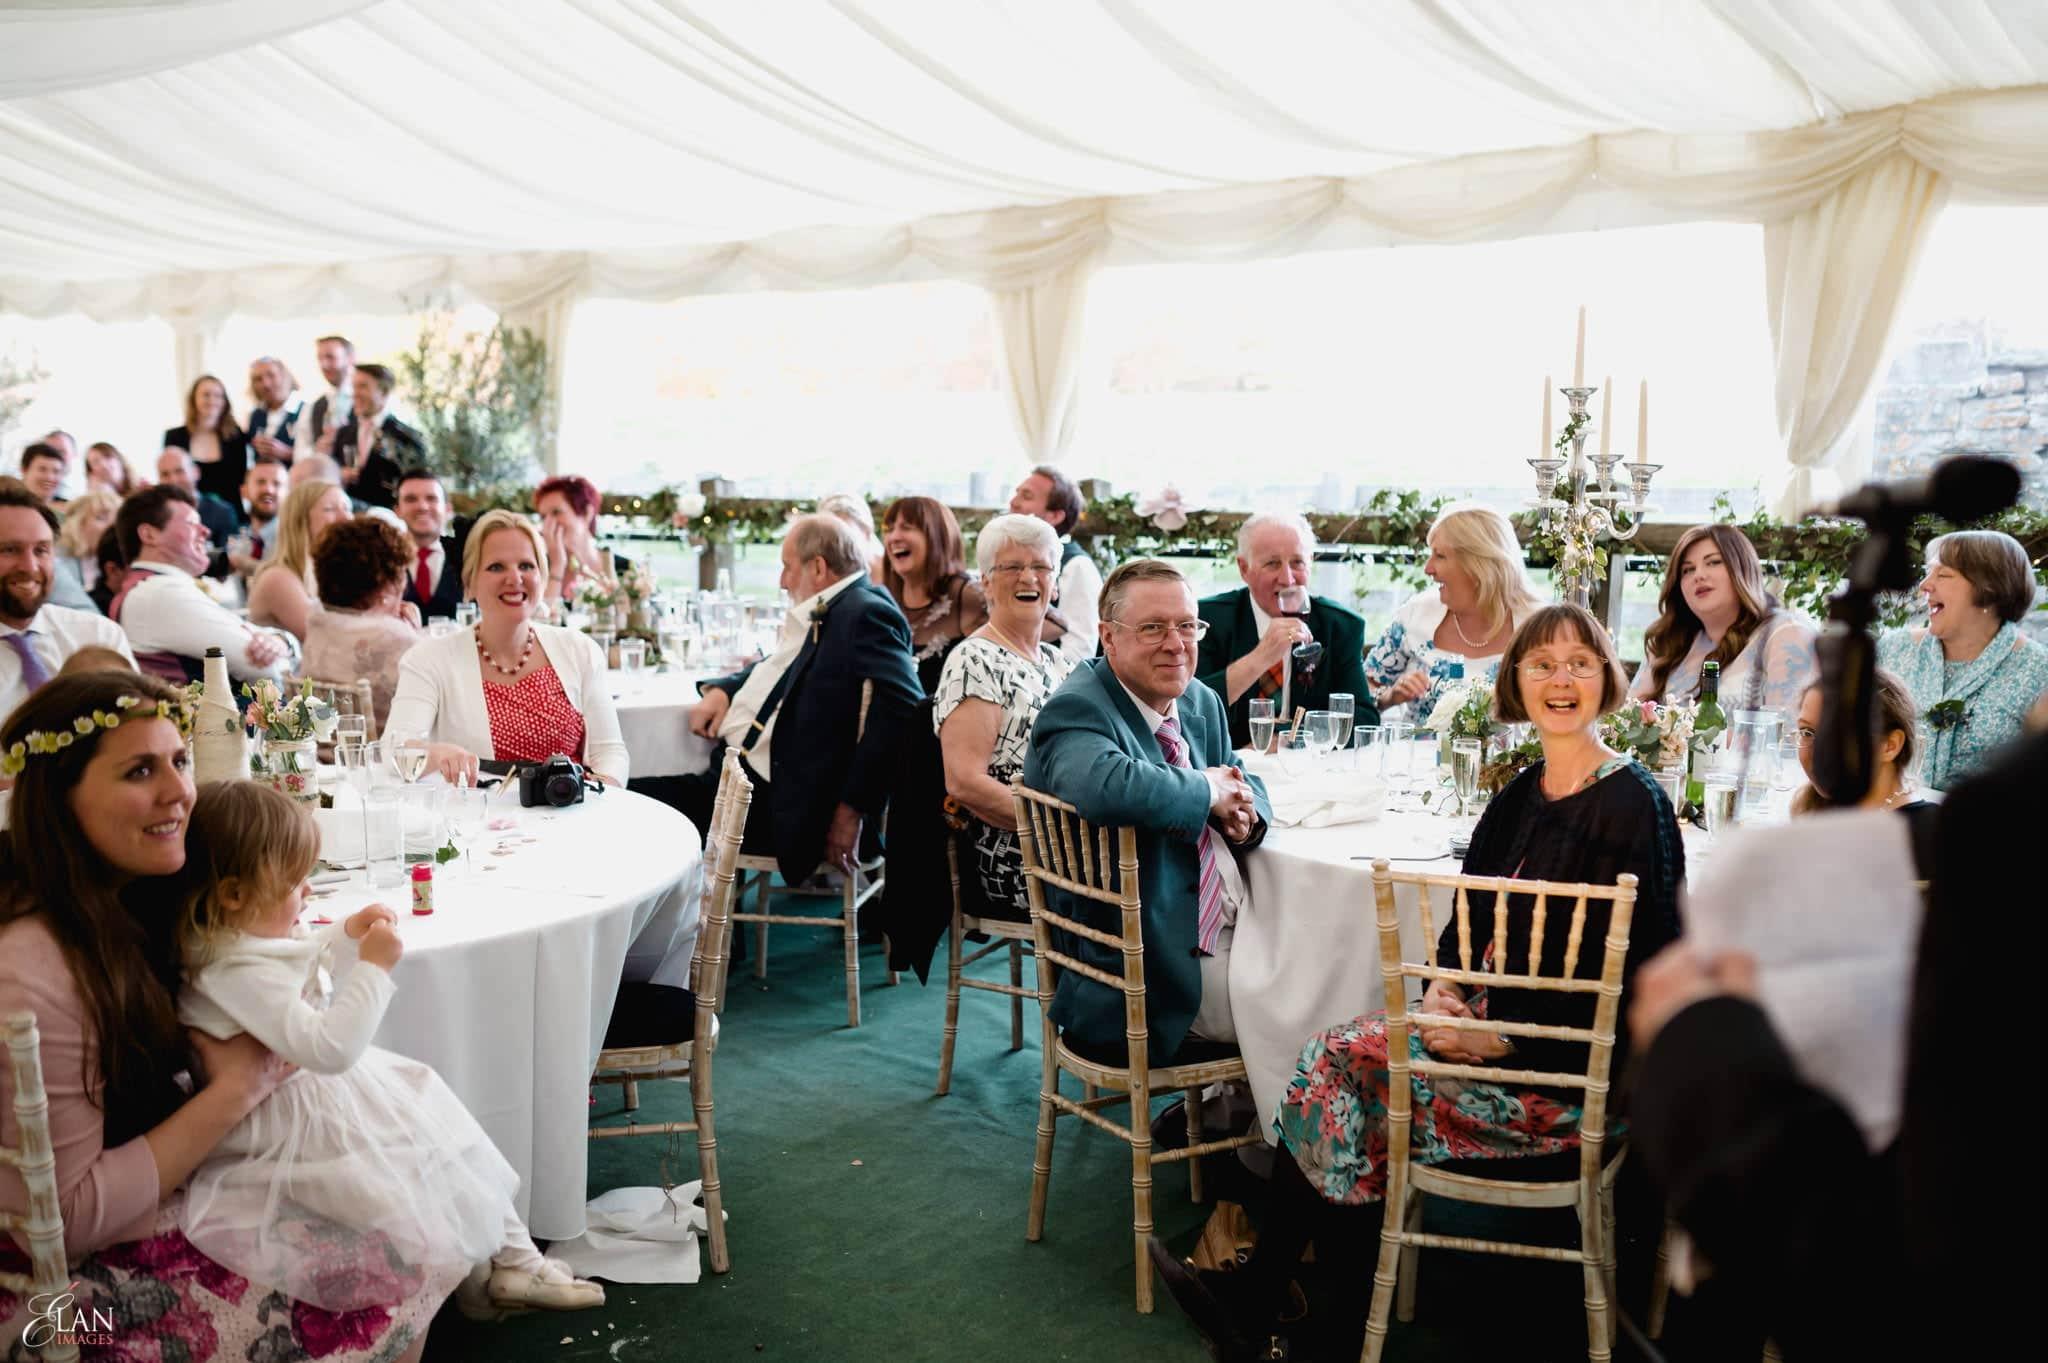 Spring Wedding at the Folly Farm Centre, Bristol 54